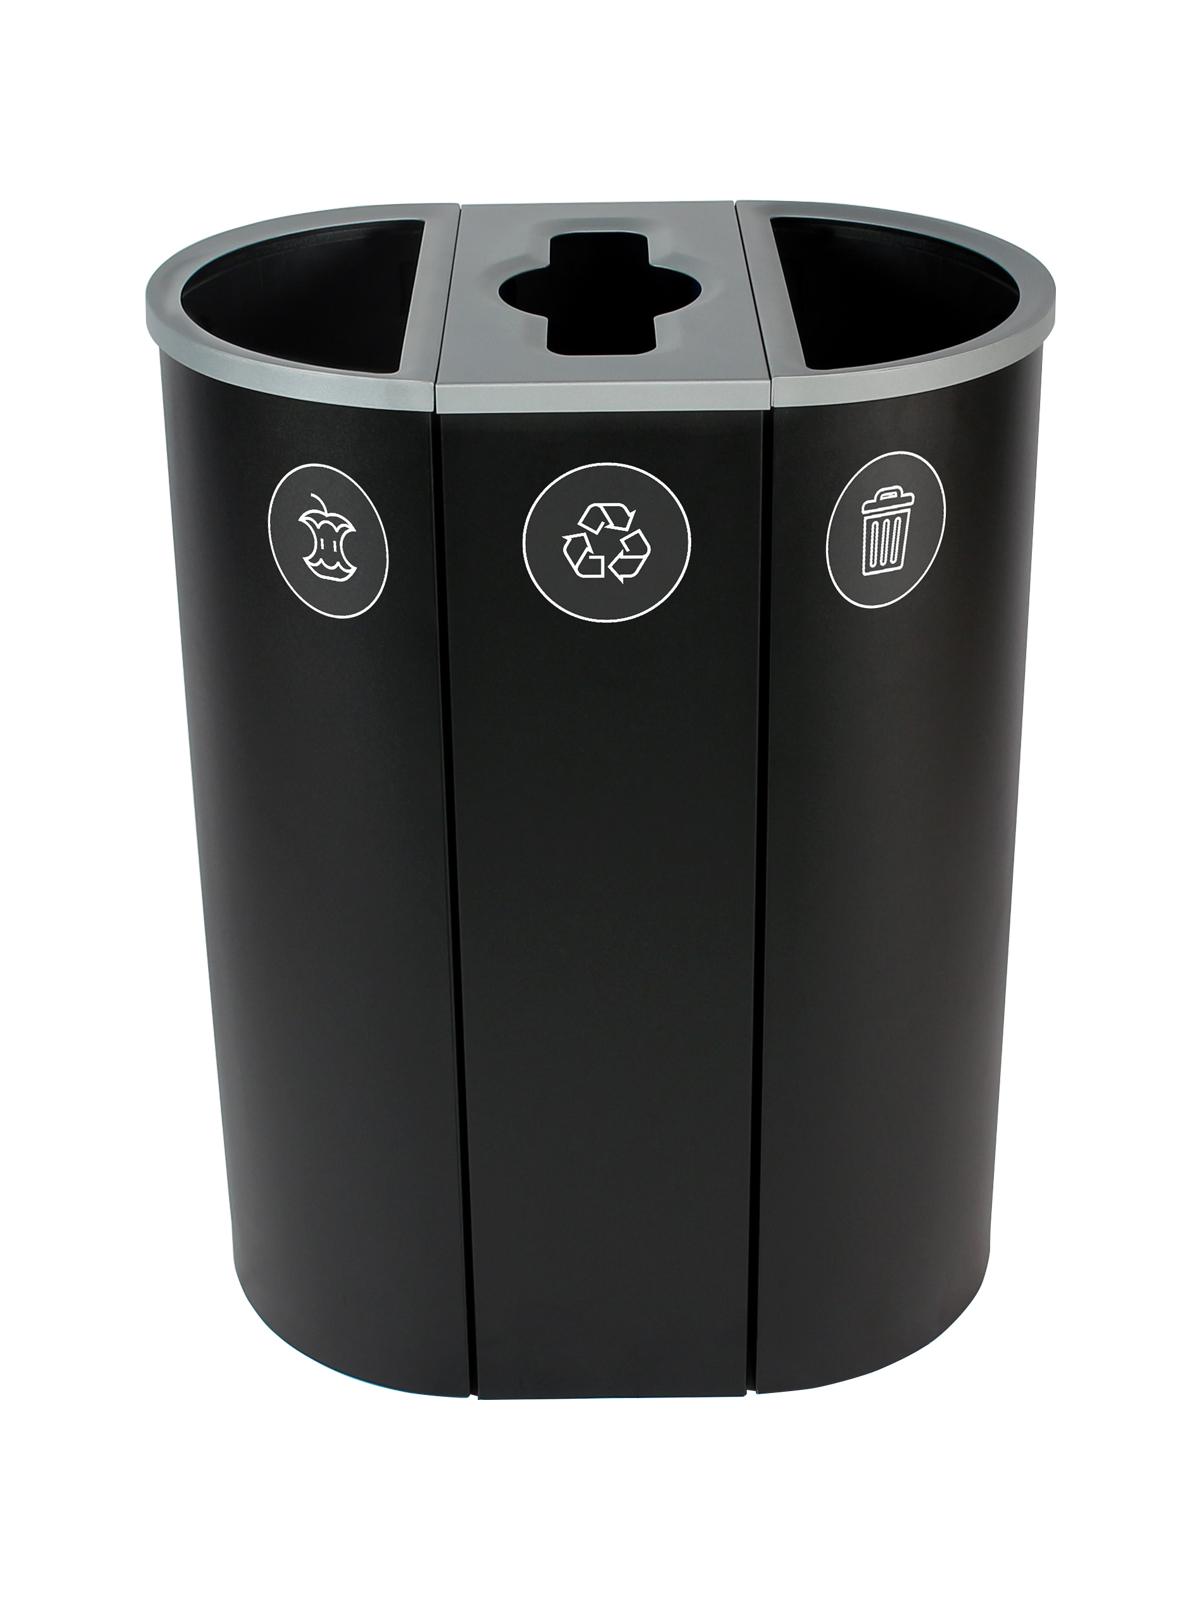 SPECTRUM - Triple - Organics-Mobius Loop-Waste - Full-Mixed-Full - Black